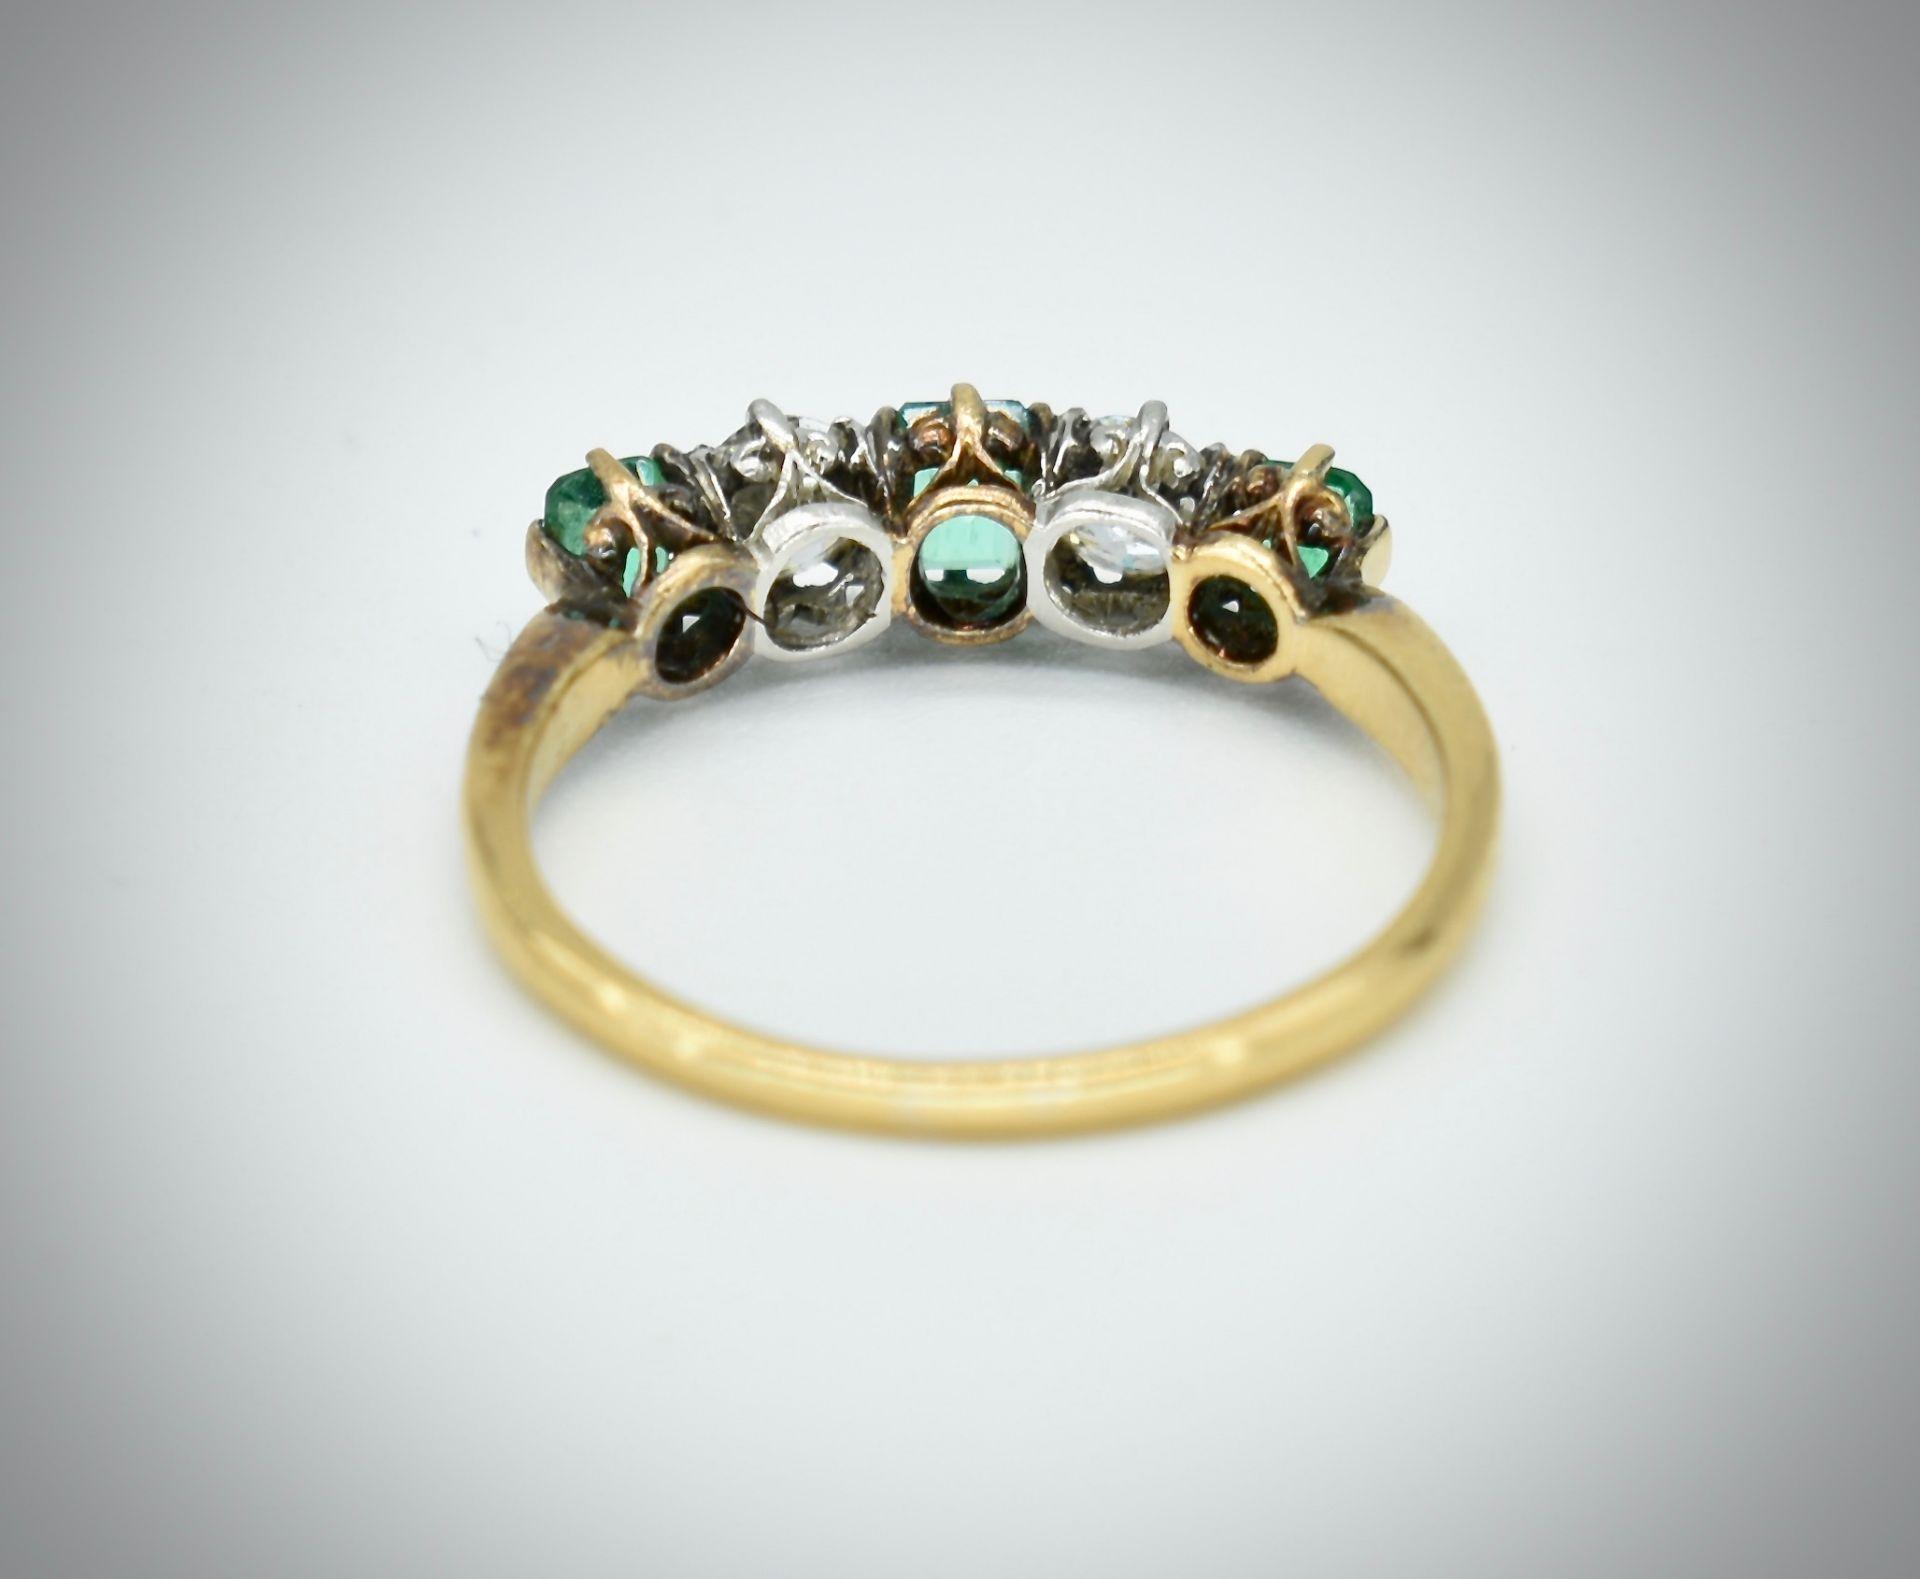 18ct Gold Emerald & Diamond Five Stone Ring - Image 4 of 7